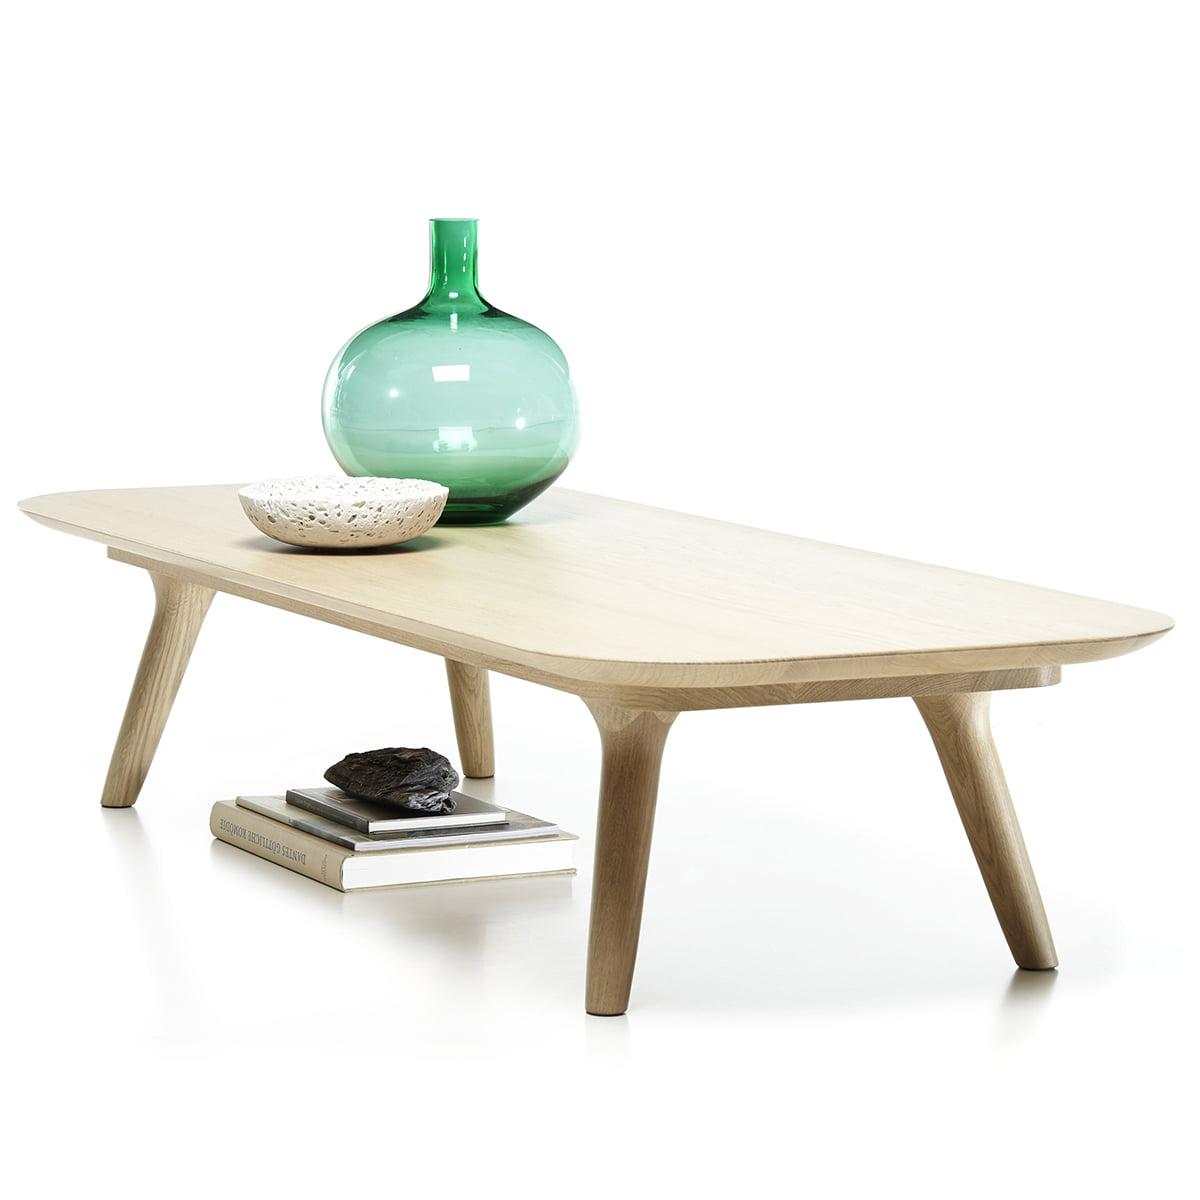 zio coffee table von moooi im shop. Black Bedroom Furniture Sets. Home Design Ideas